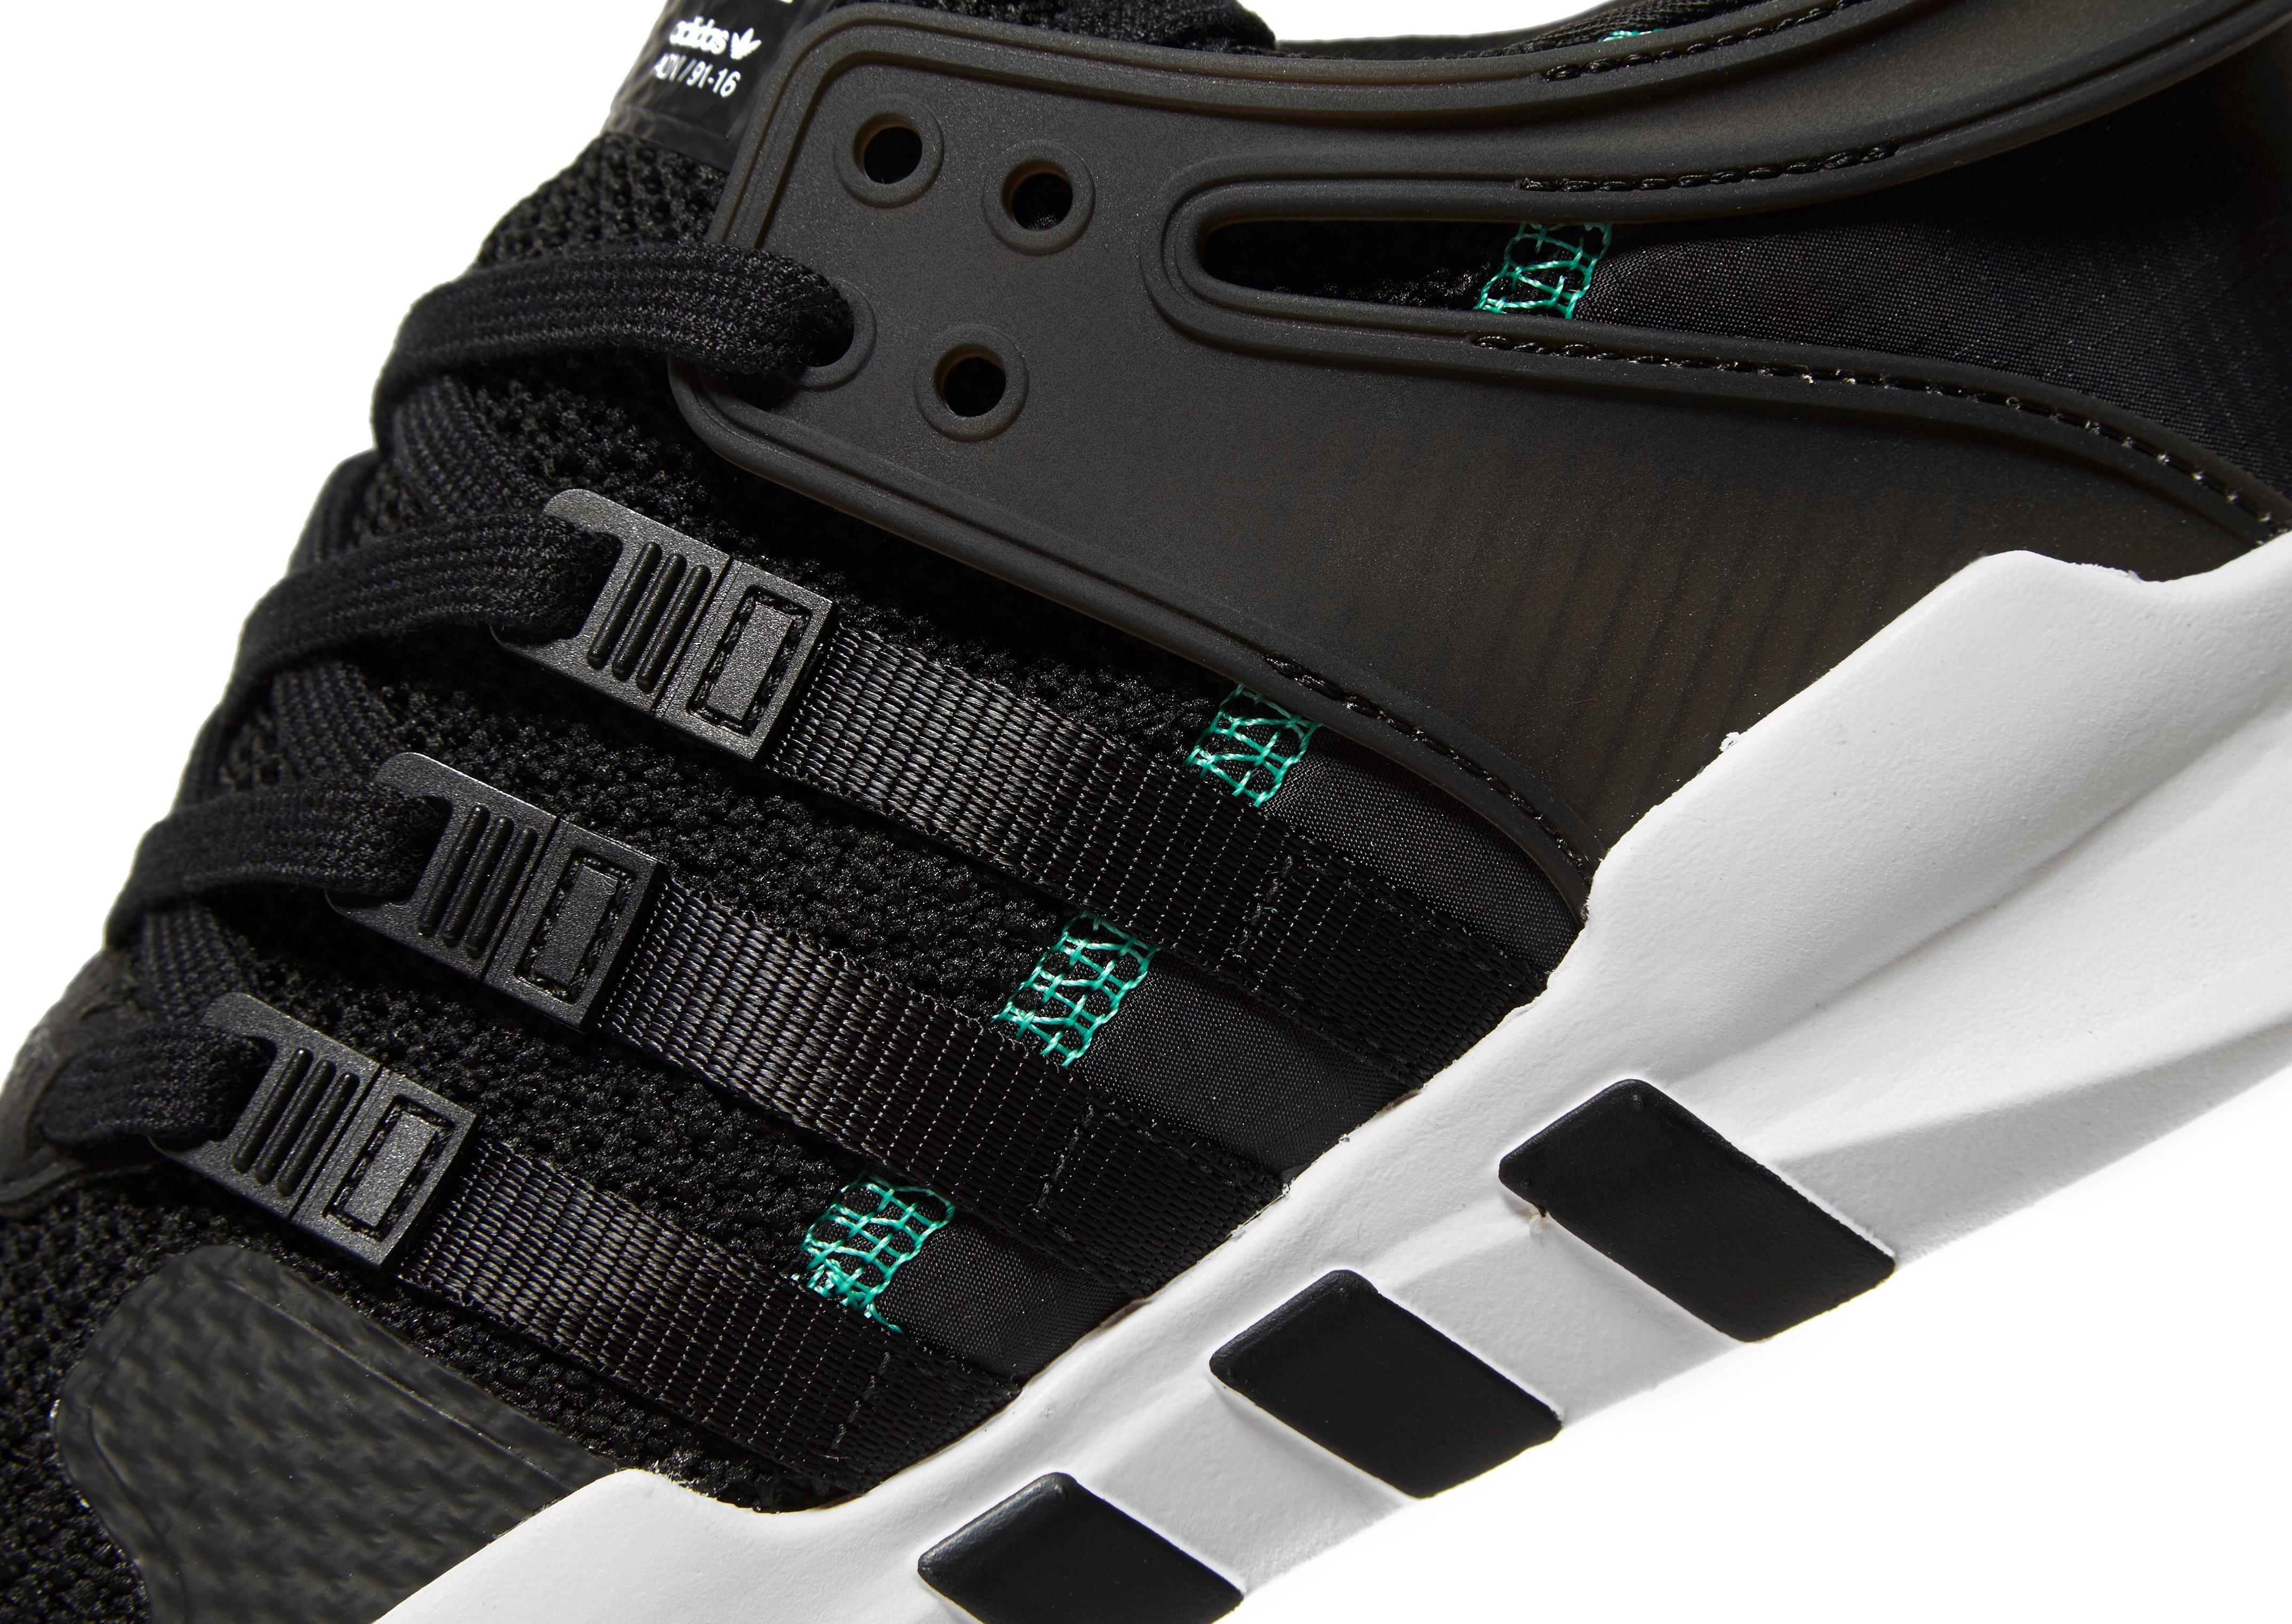 Http Real 94nplr1h Localdrfixitcouk Image Dea Sepatu Anak Sneakers Lace 1704 161 Black Size 31 36 Adidas Originals Blackblack Eqt Support Adv Ripstopjpeg